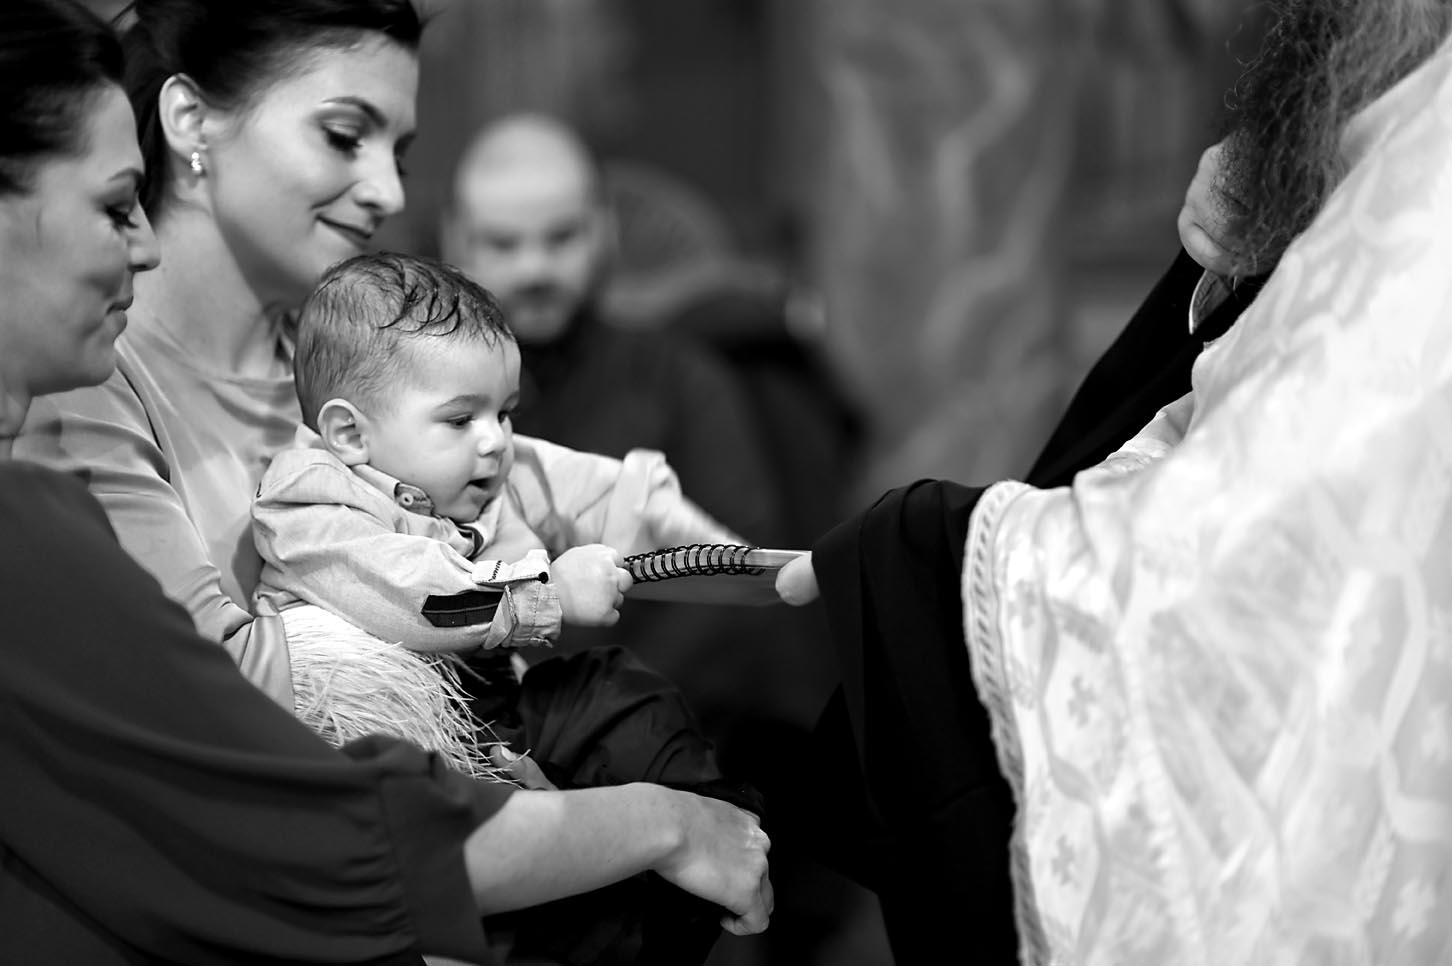 baptism-dfsfsdfsdfsdfsdfdetails-agios-charalampos-01